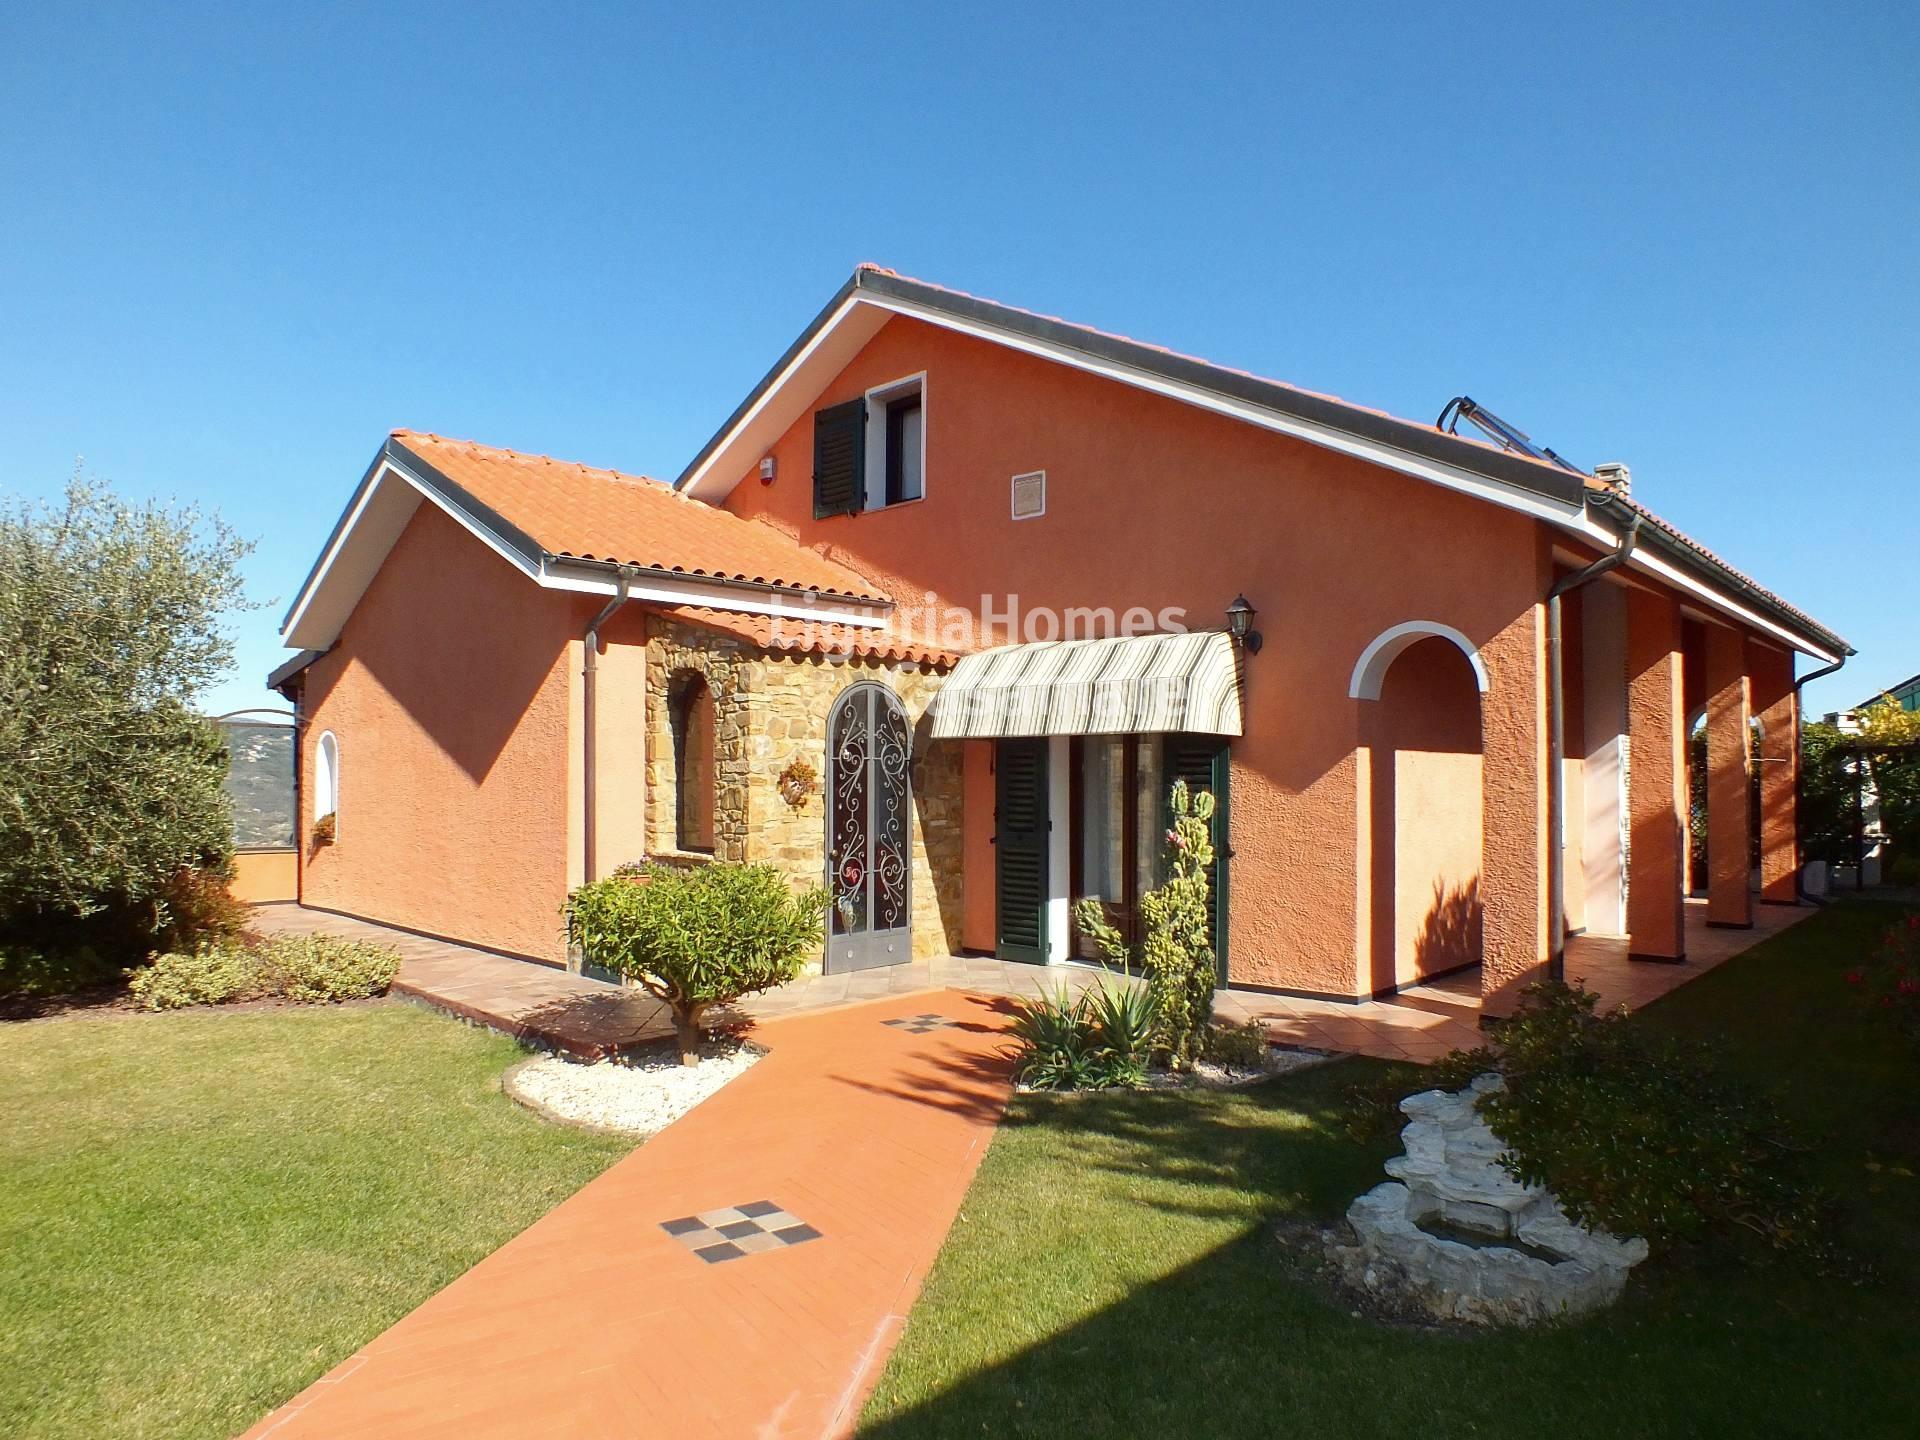 Villa for Sale in Imperia Ref 6V19